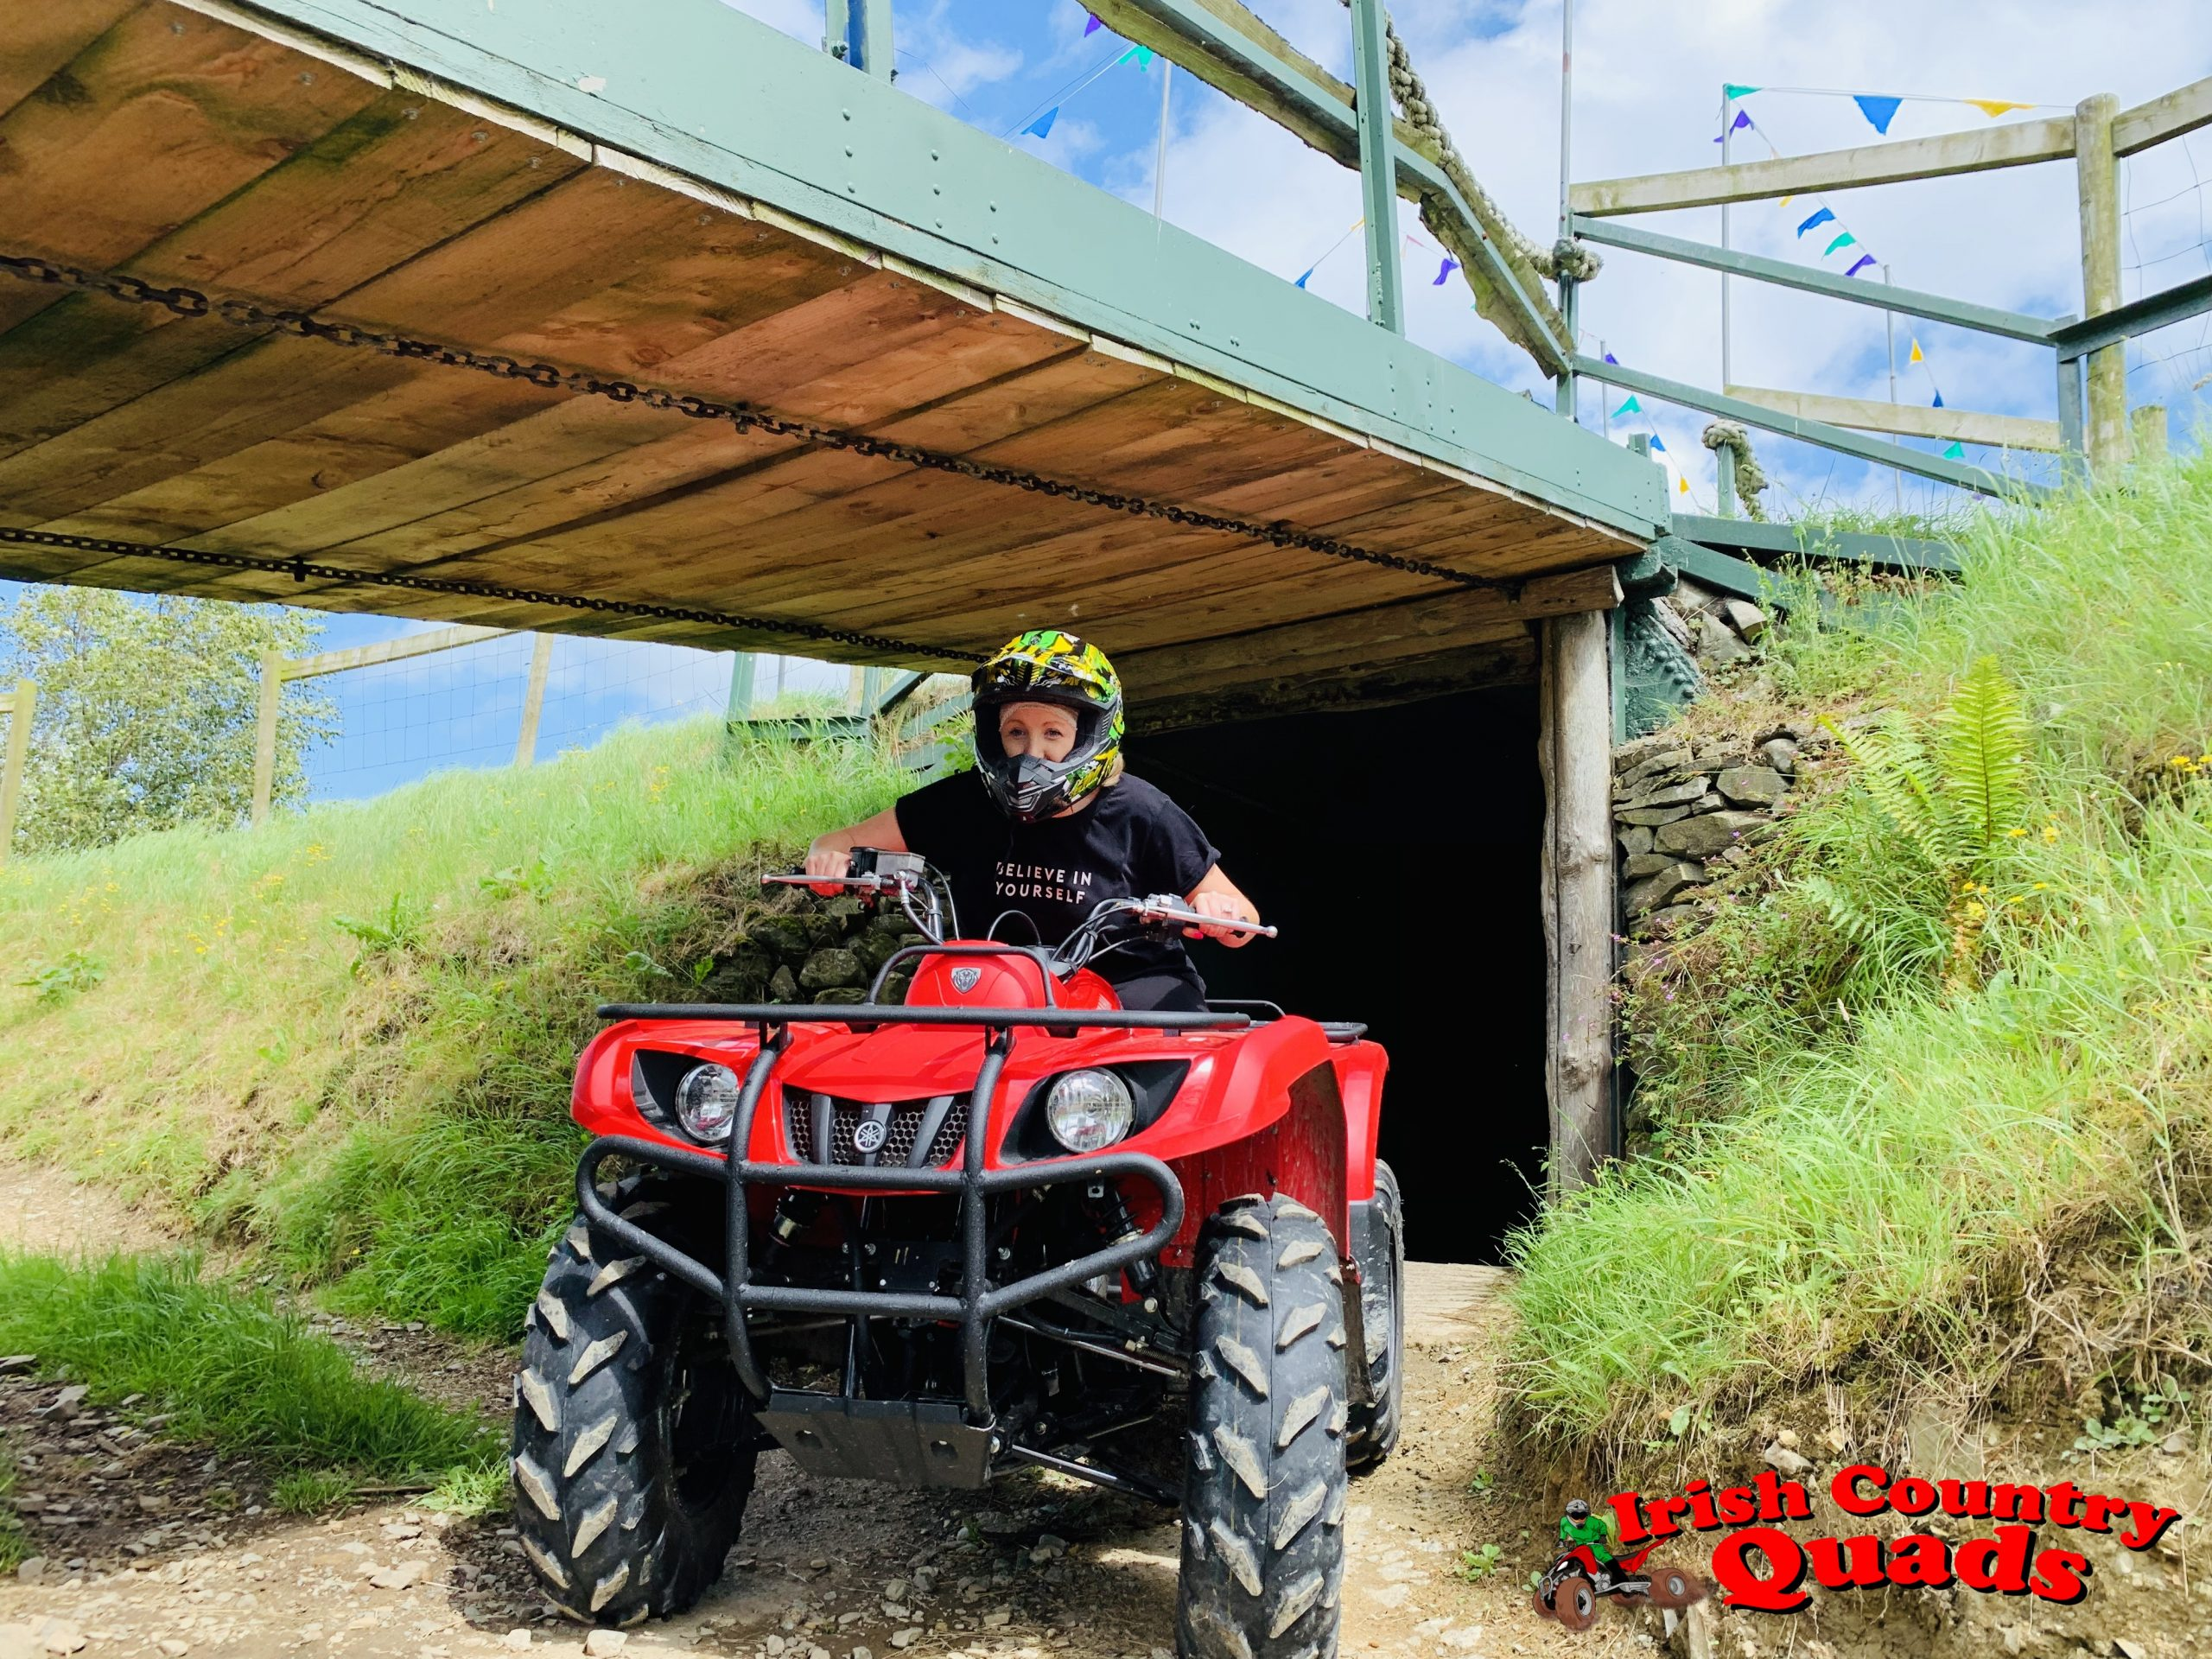 Irish Country Quads Adventure Activities quad bike track trail course bridge tunnel